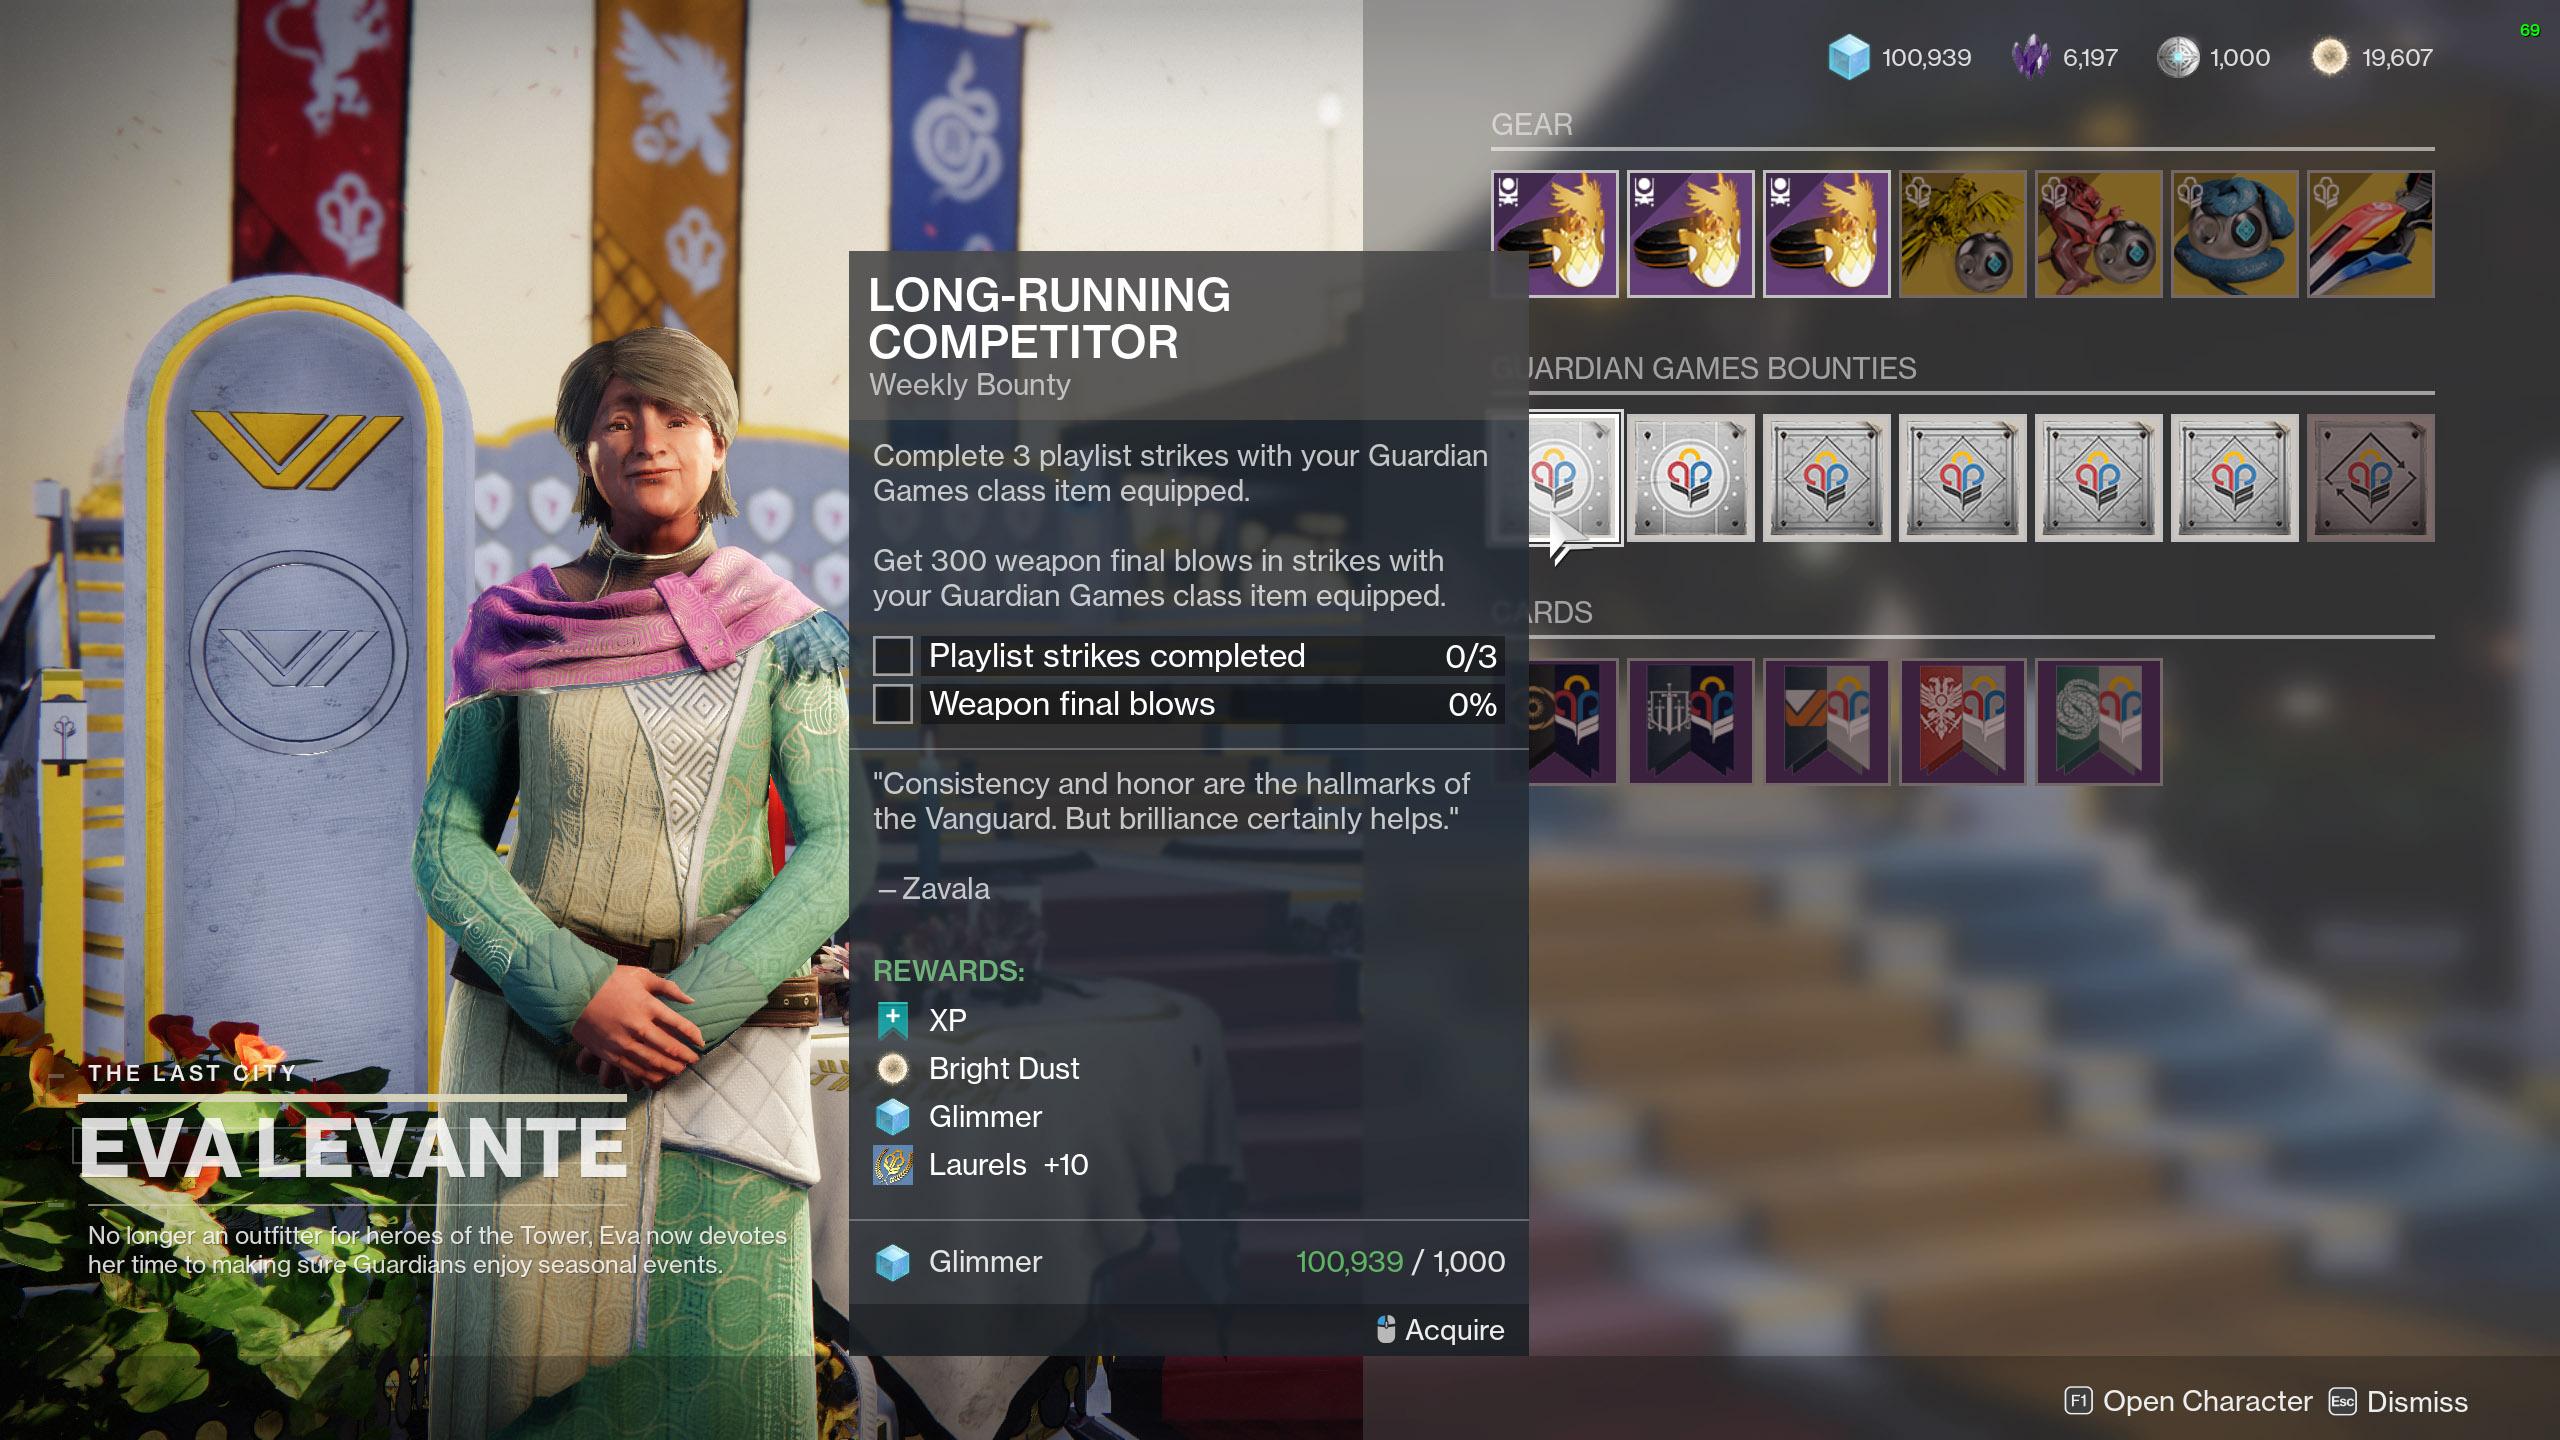 destiny 2 guardian games 2021 weekly bounties